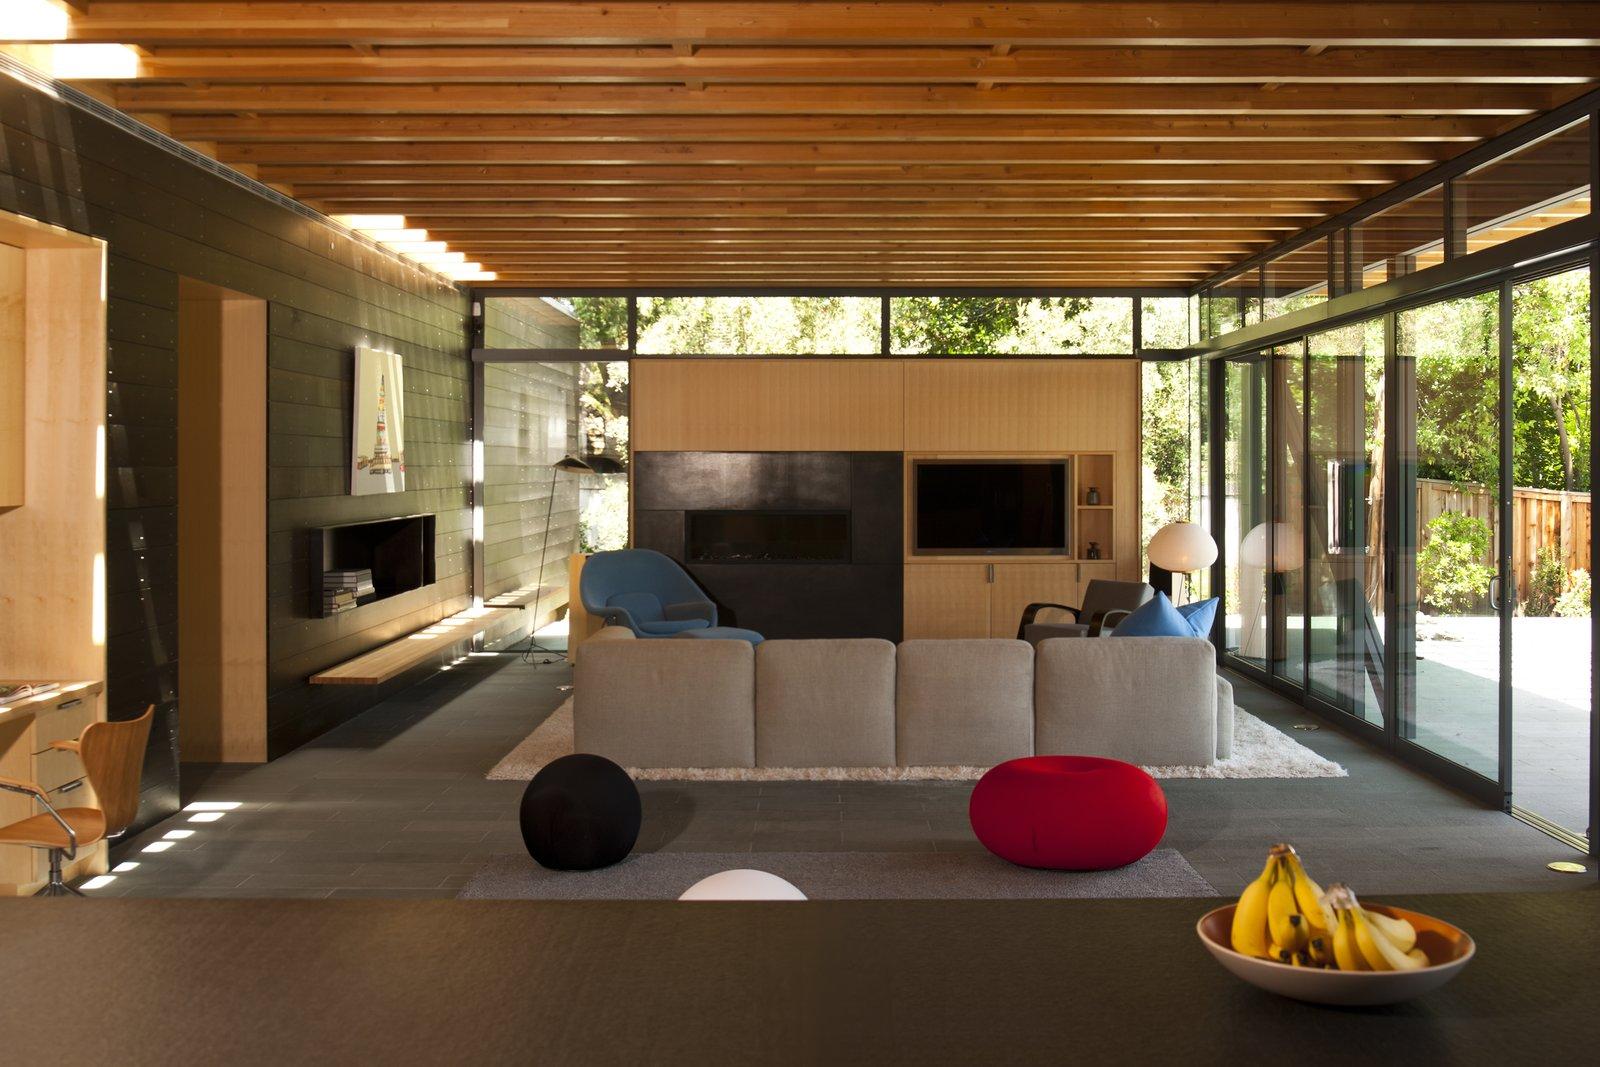 Sacramento House by Bohlin Cywinski Jackson